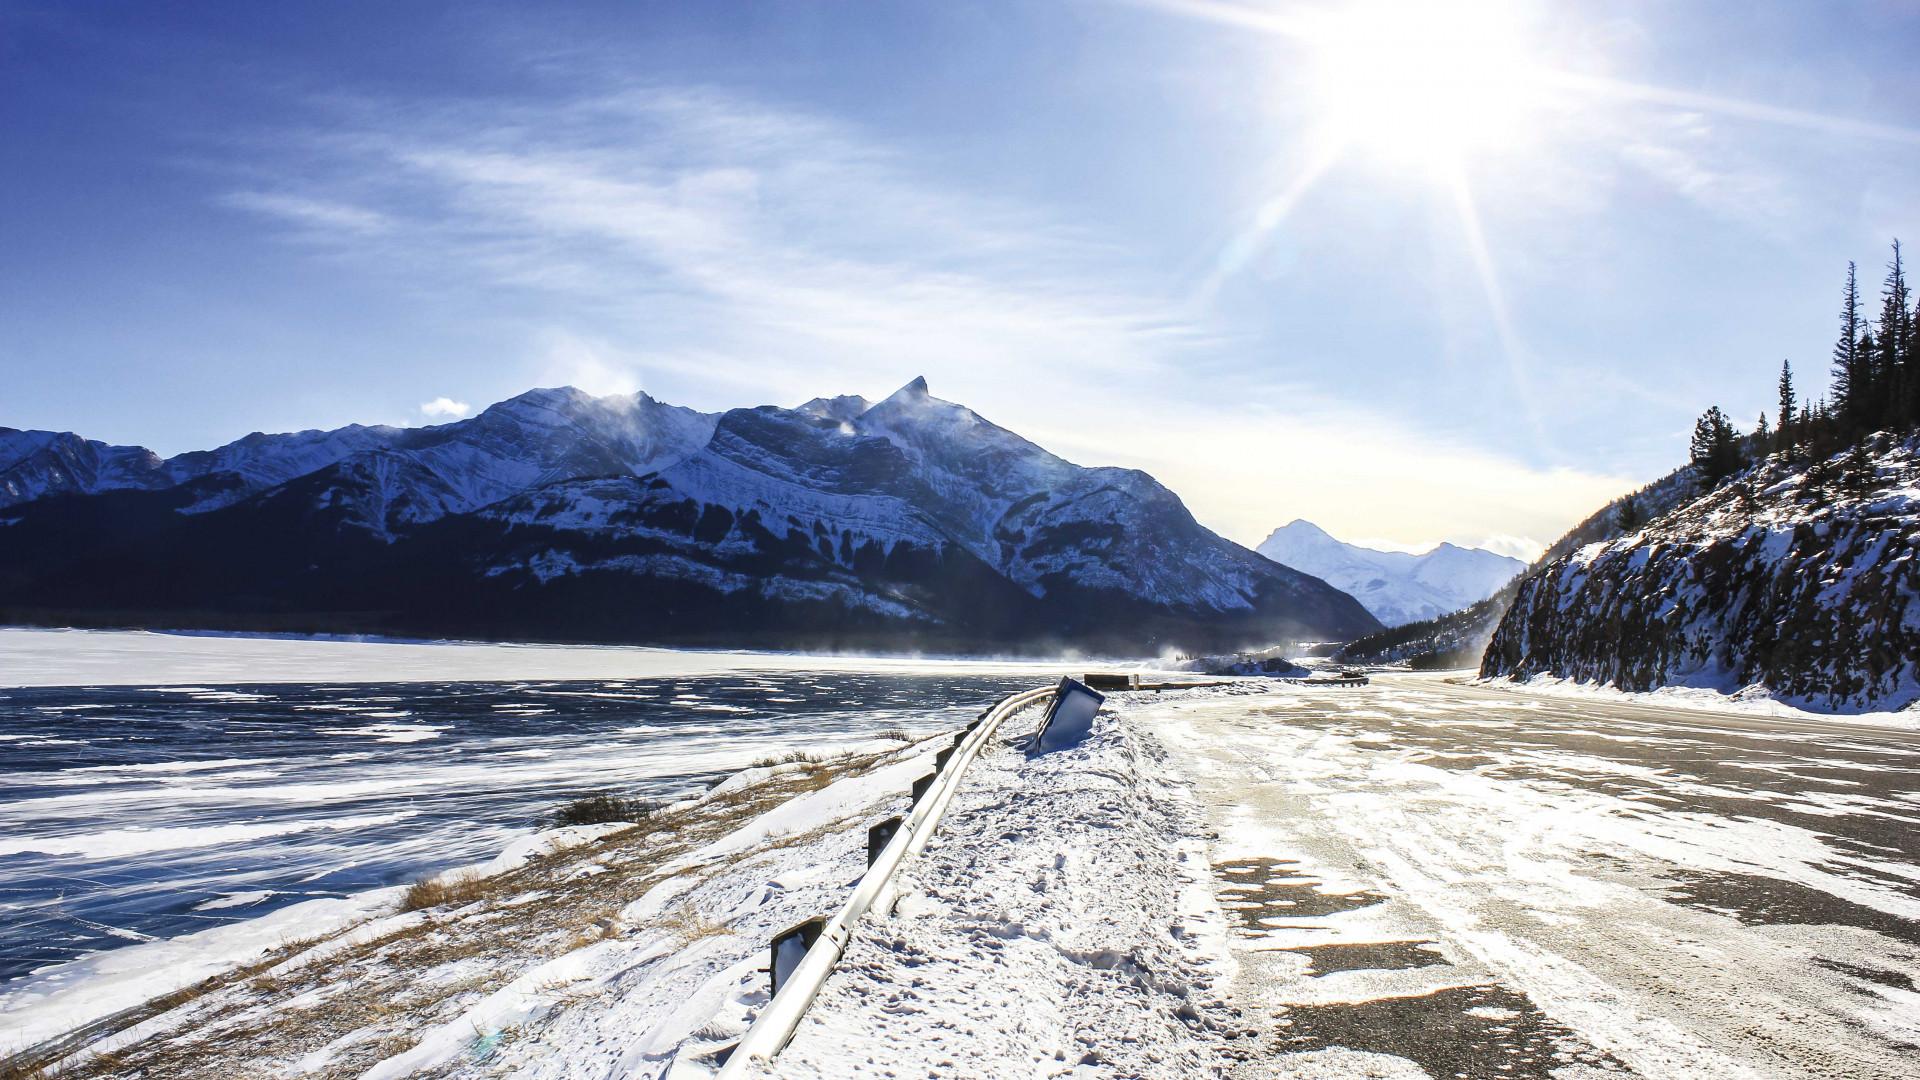 Road tripping in Alberta, Canada